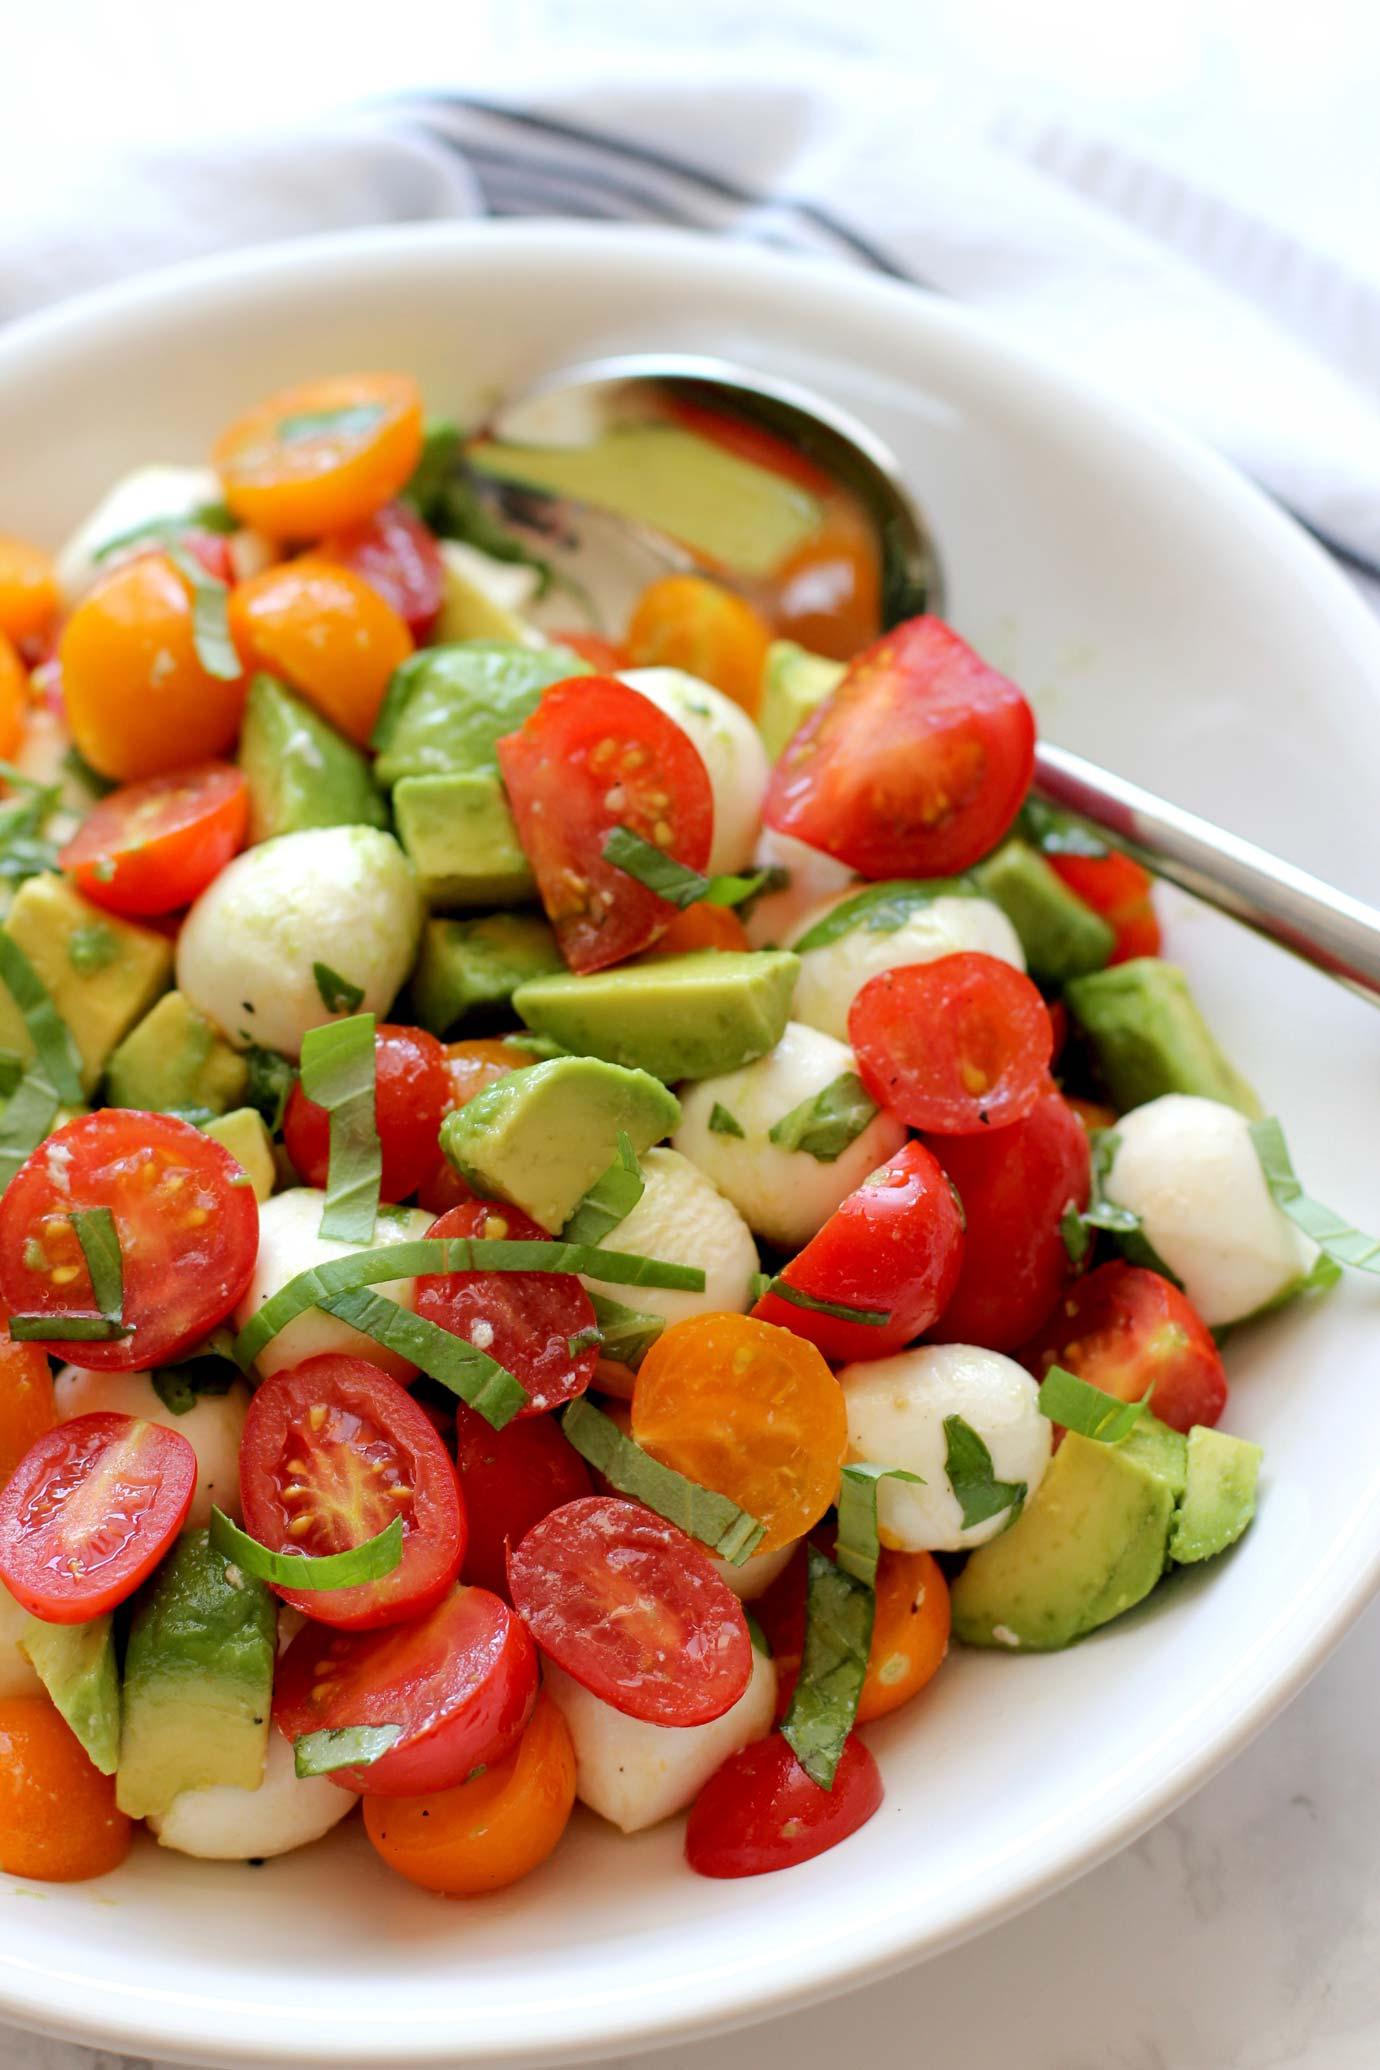 Tomato mozzarella avocado salad in a white bowl with a silver spoon.